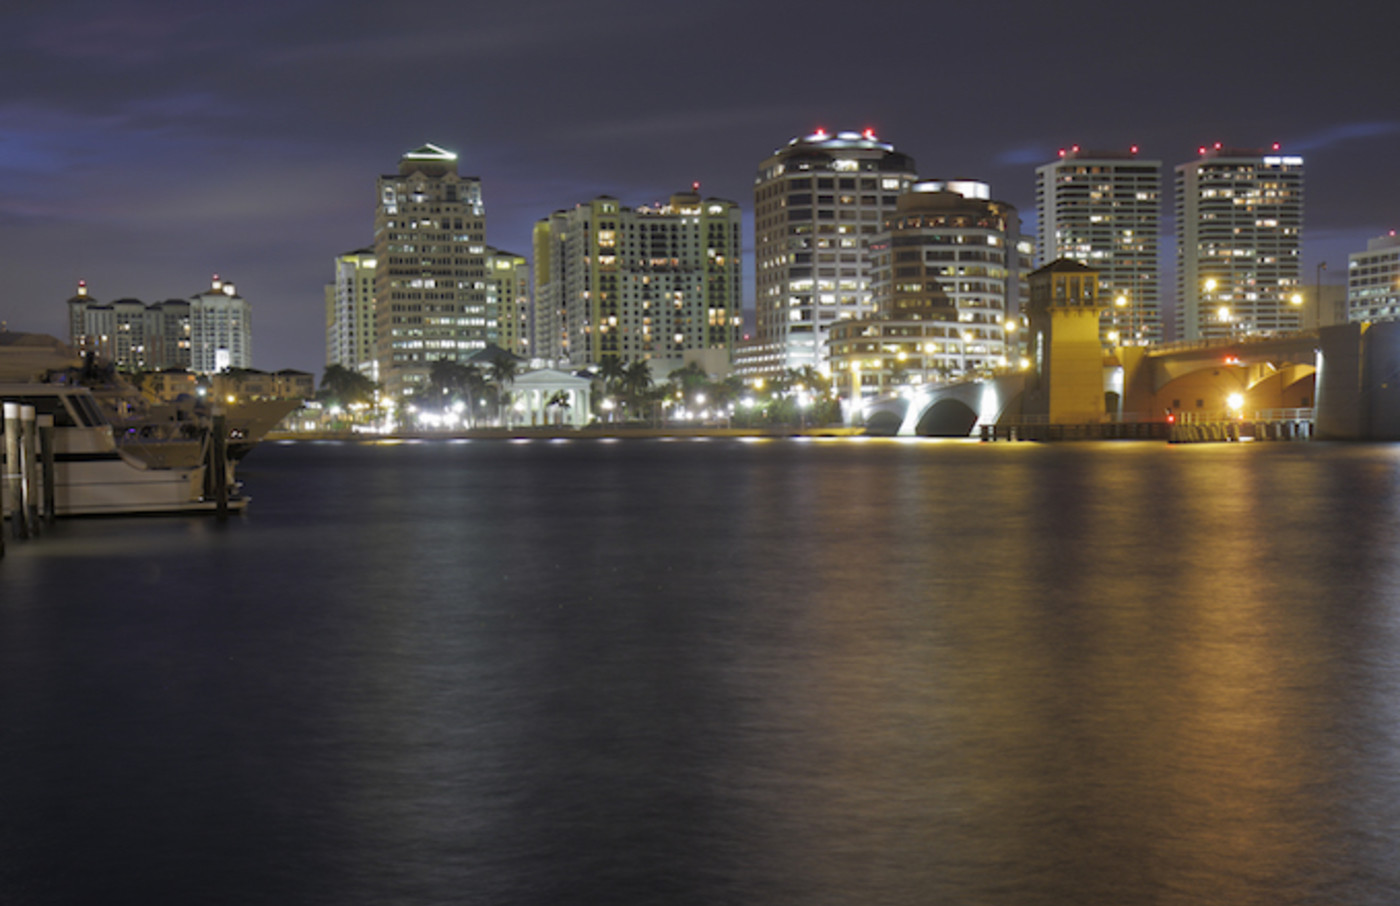 West Palm Beach city skyline at night.